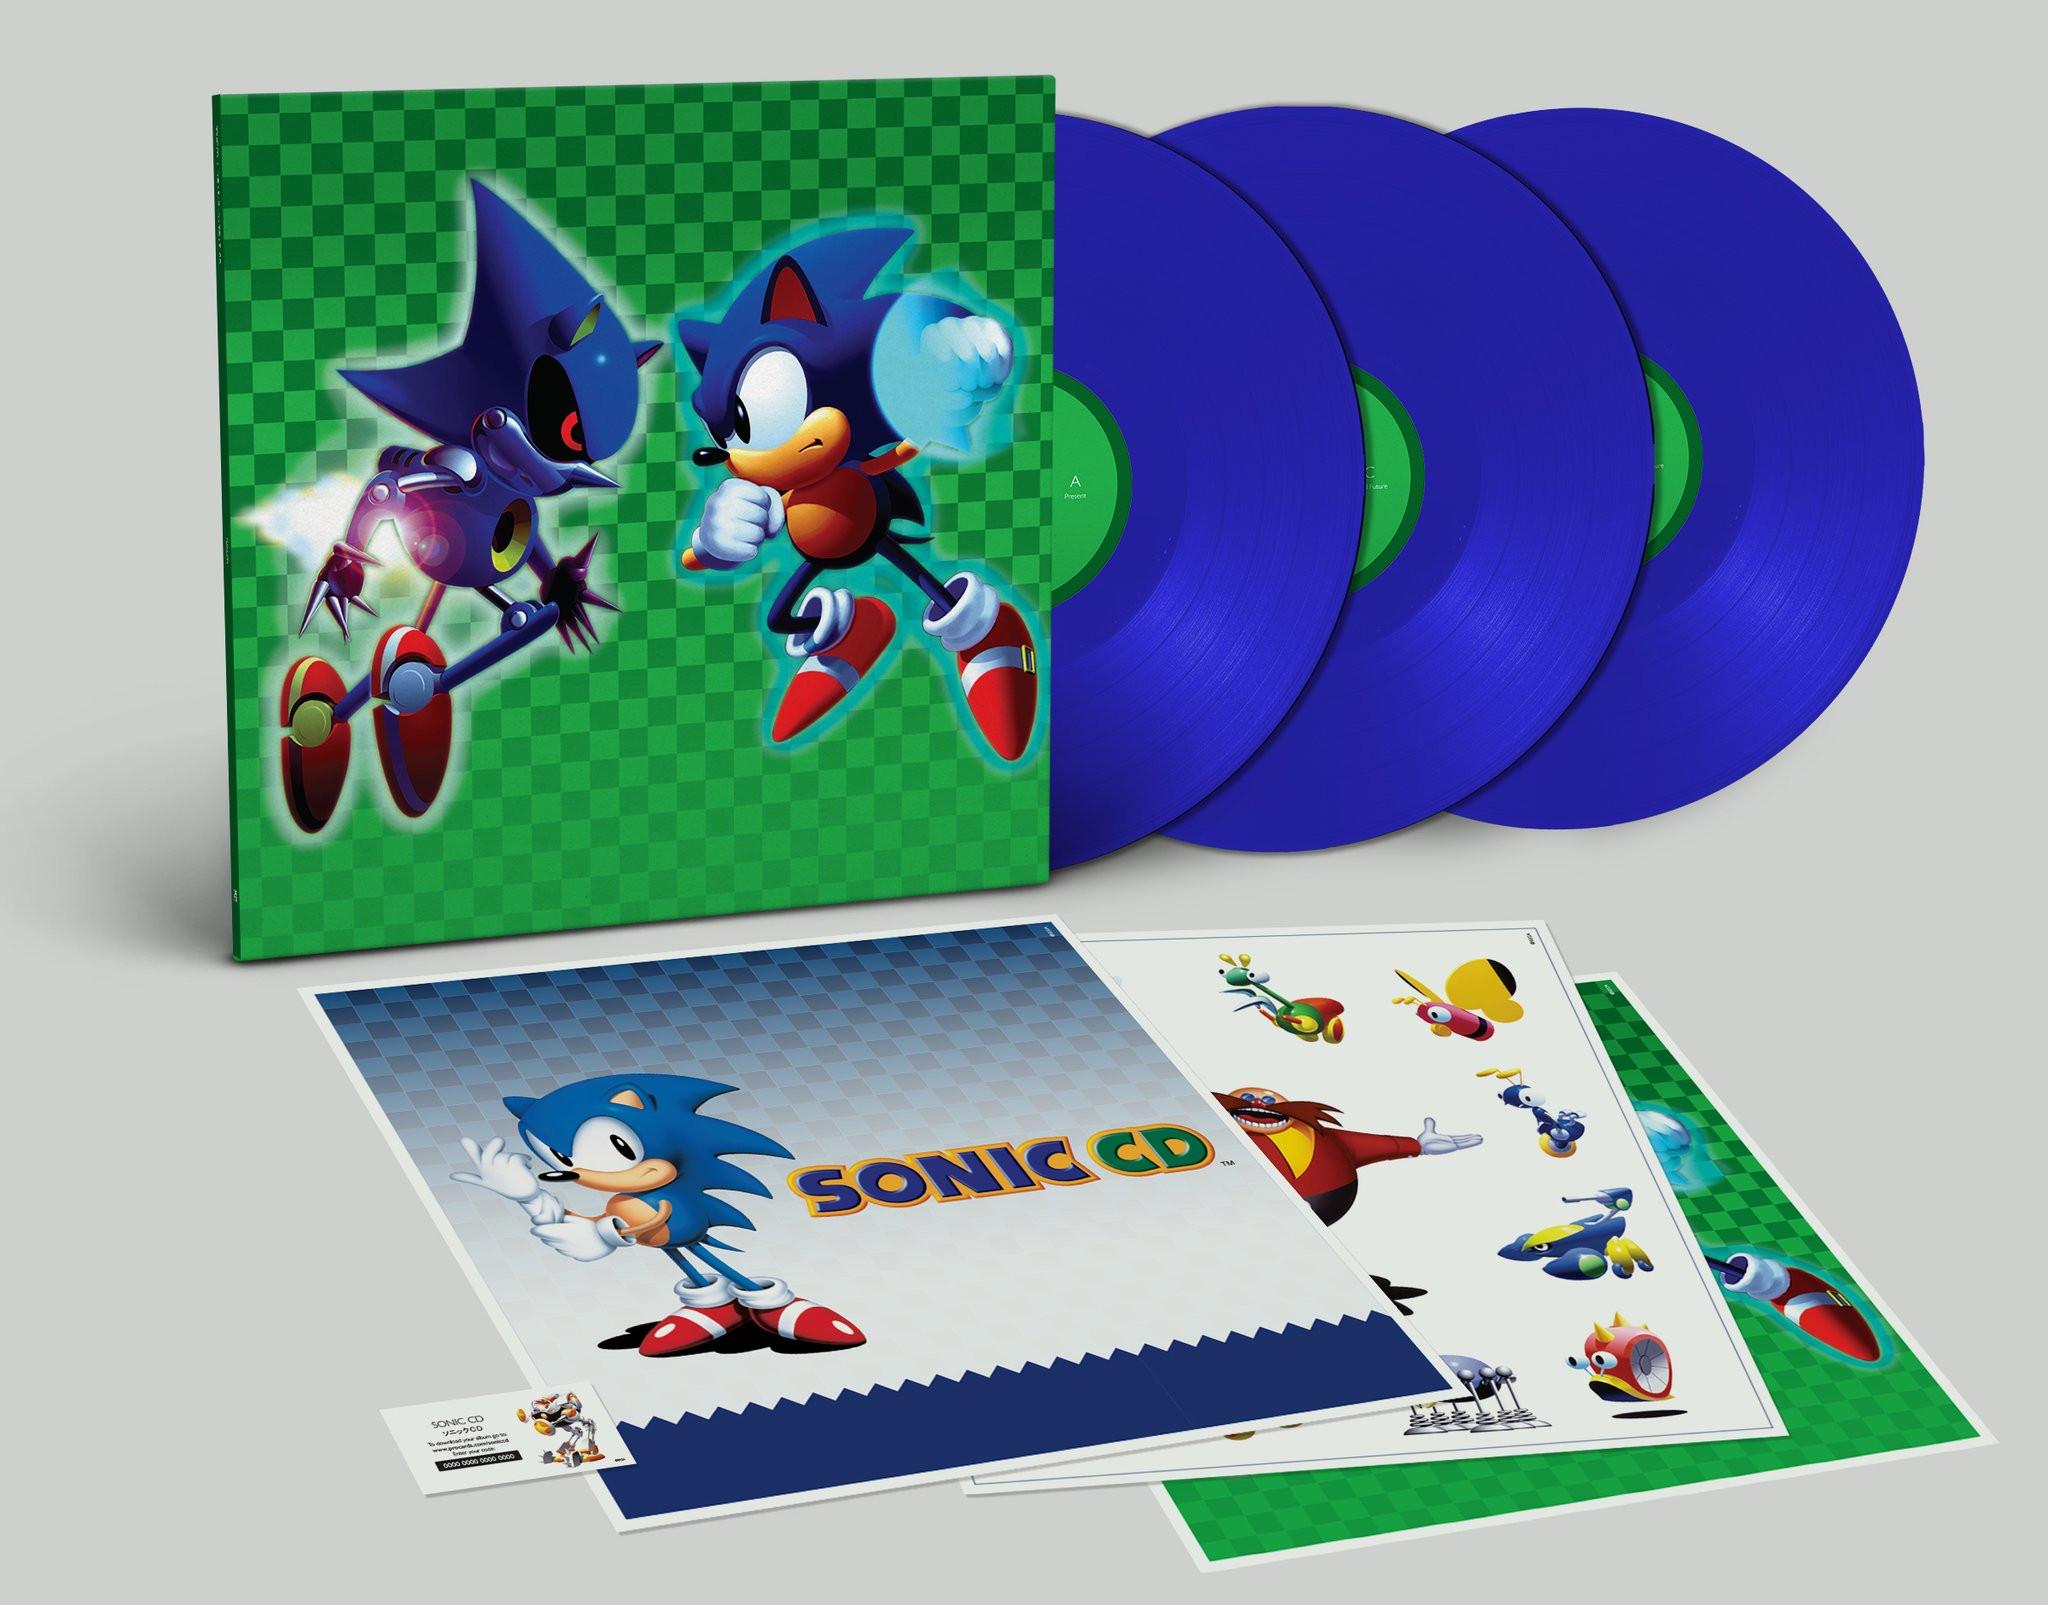 NAOFUMI HATAYA AND MASFUMI OGATA: Sonic CD (aka Sonic The